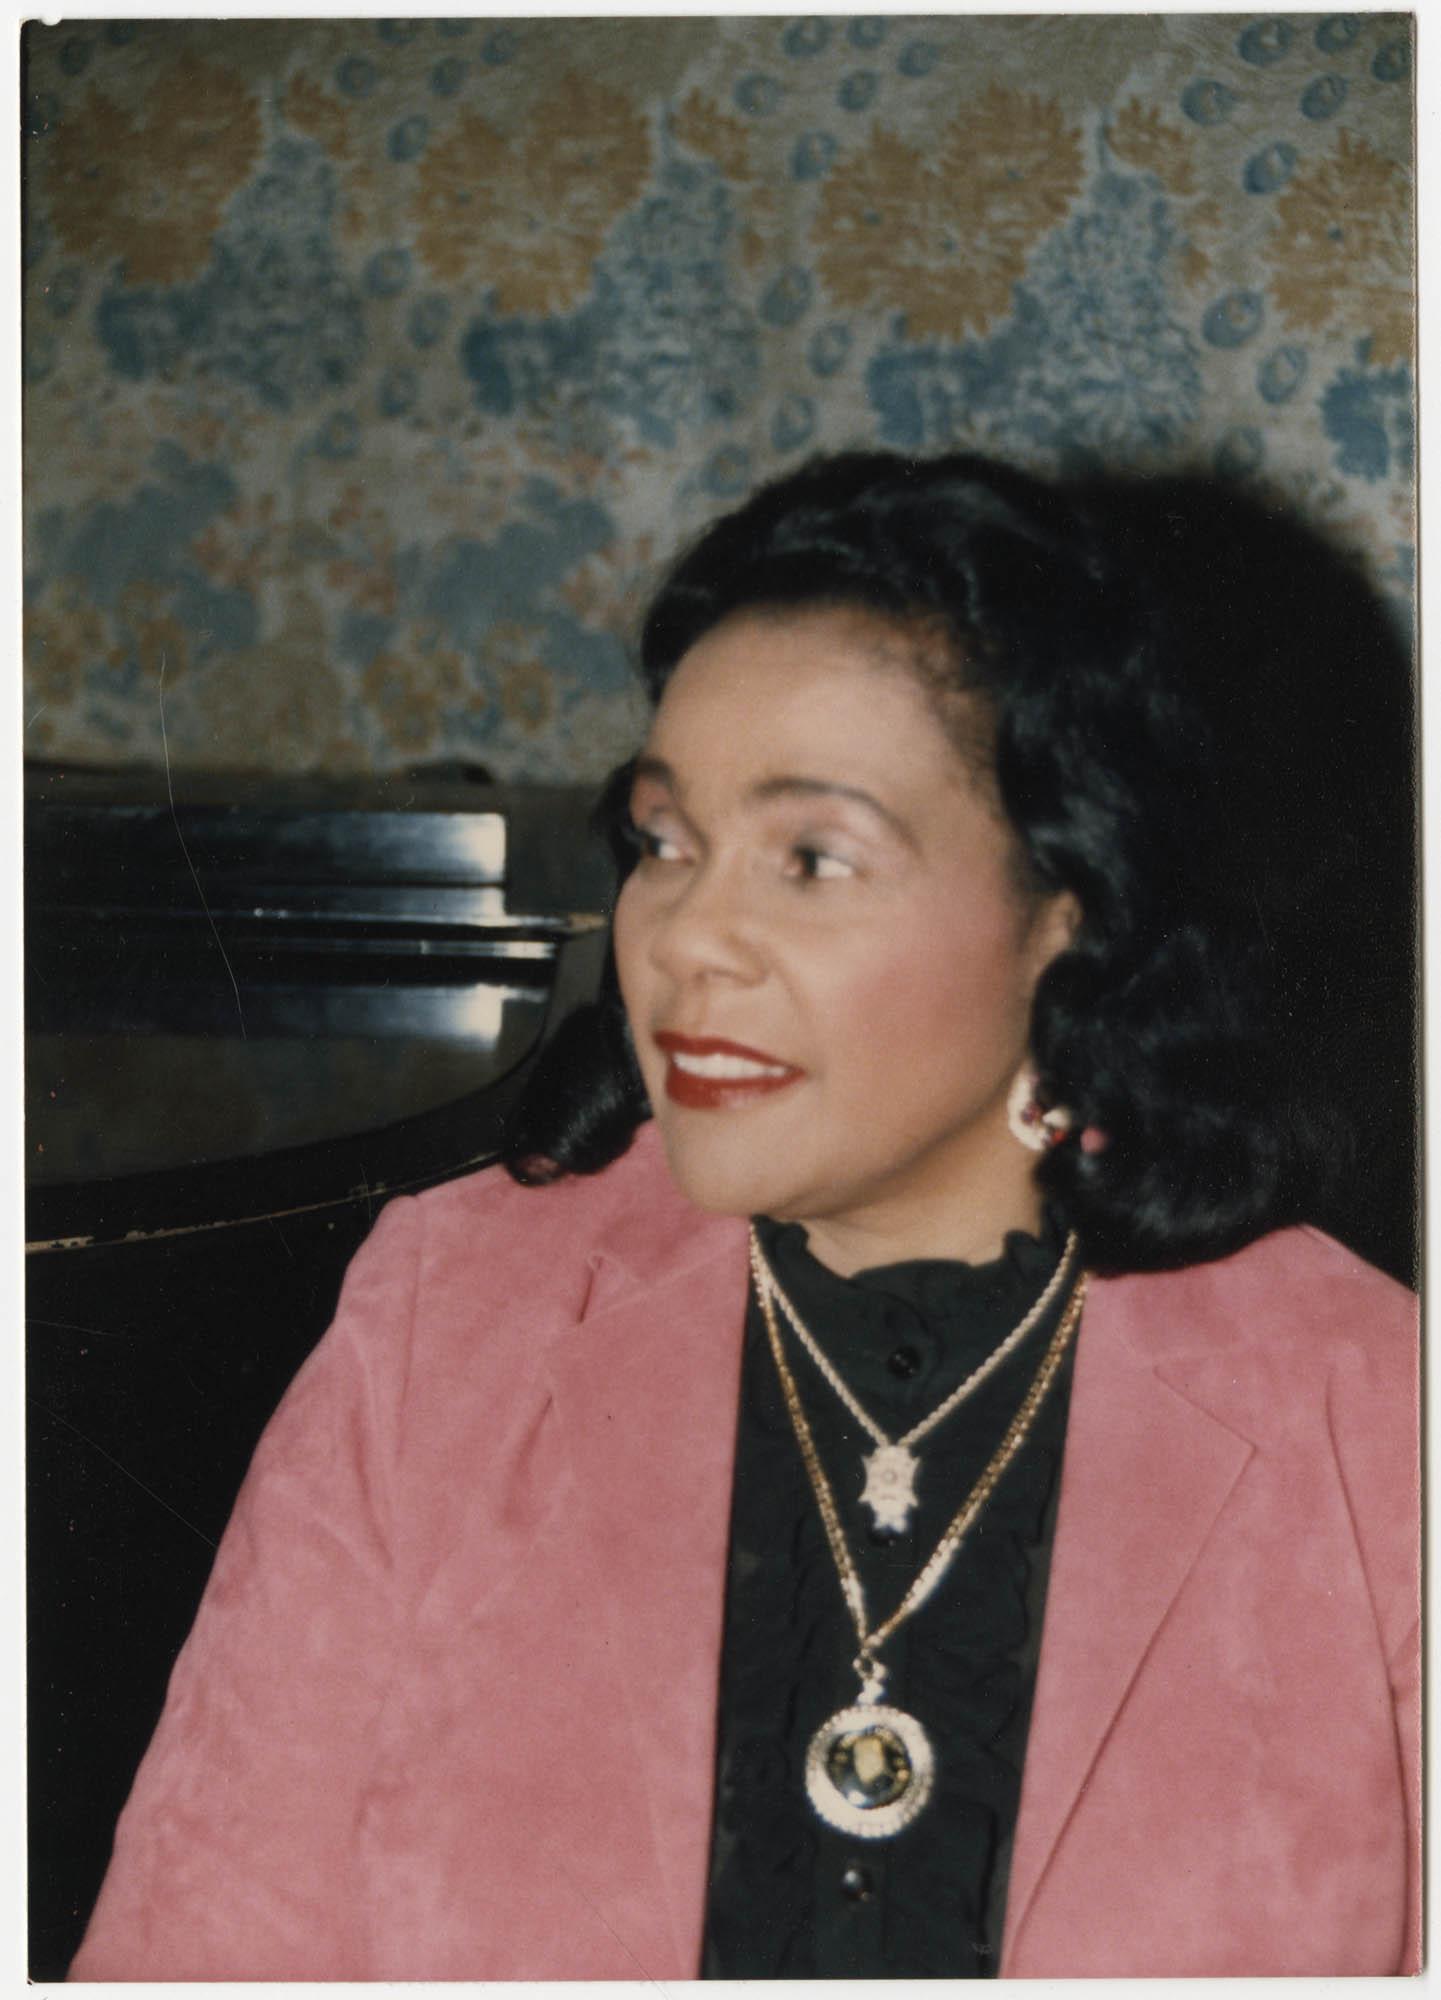 Photograph of Coretta Scott King